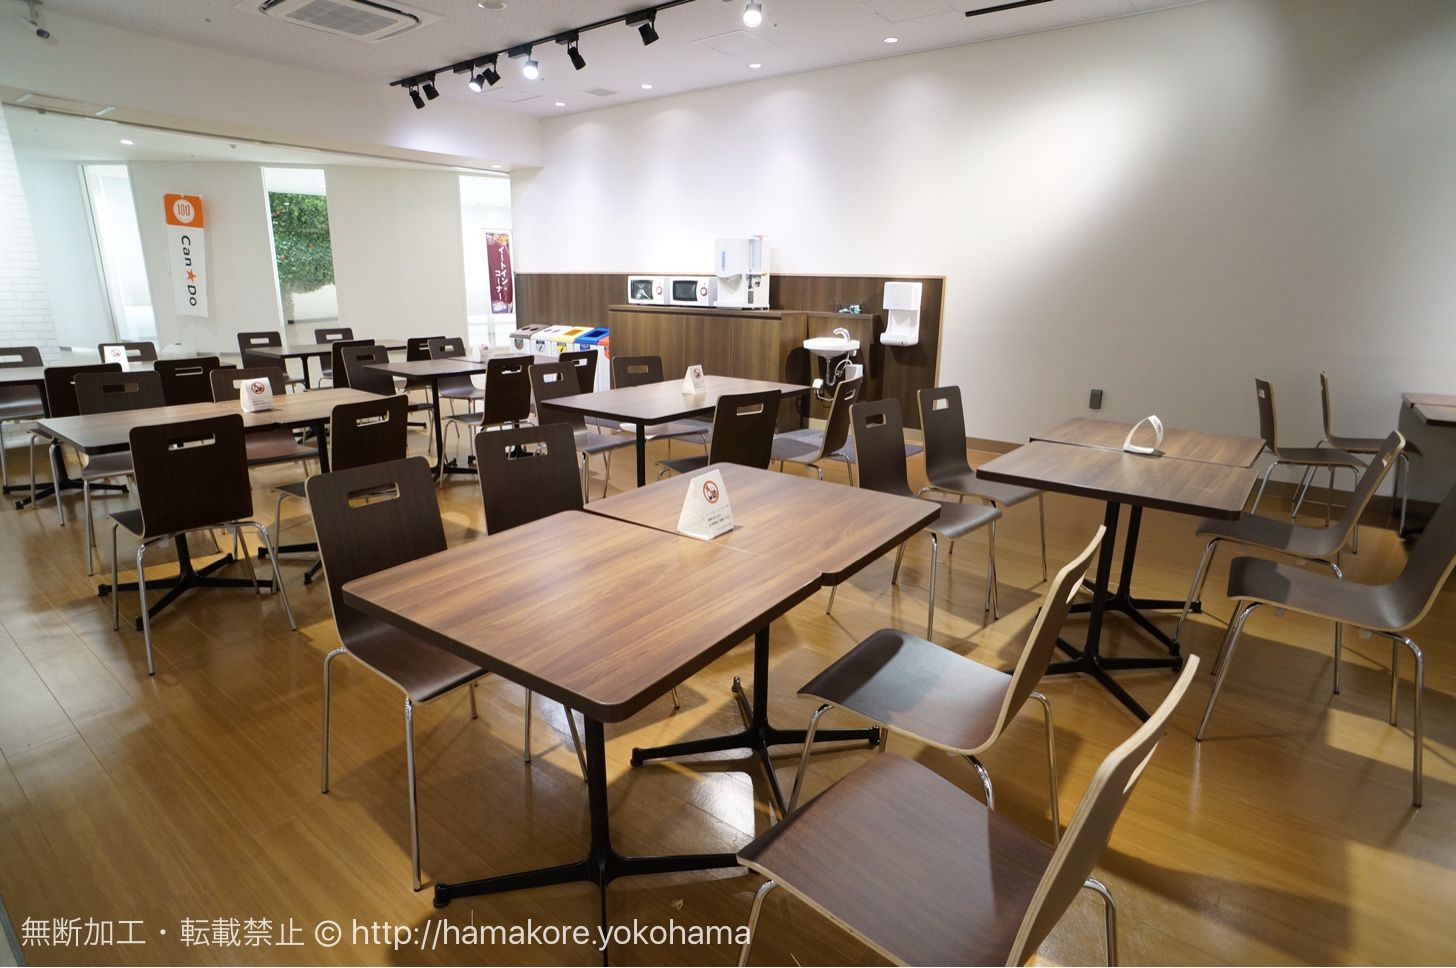 Ok みなとみらい店のフードコートが2月10日オープン Ok直営焼肉店 和 やオーケー食堂 旬 フードコート 食堂 みなとみらい